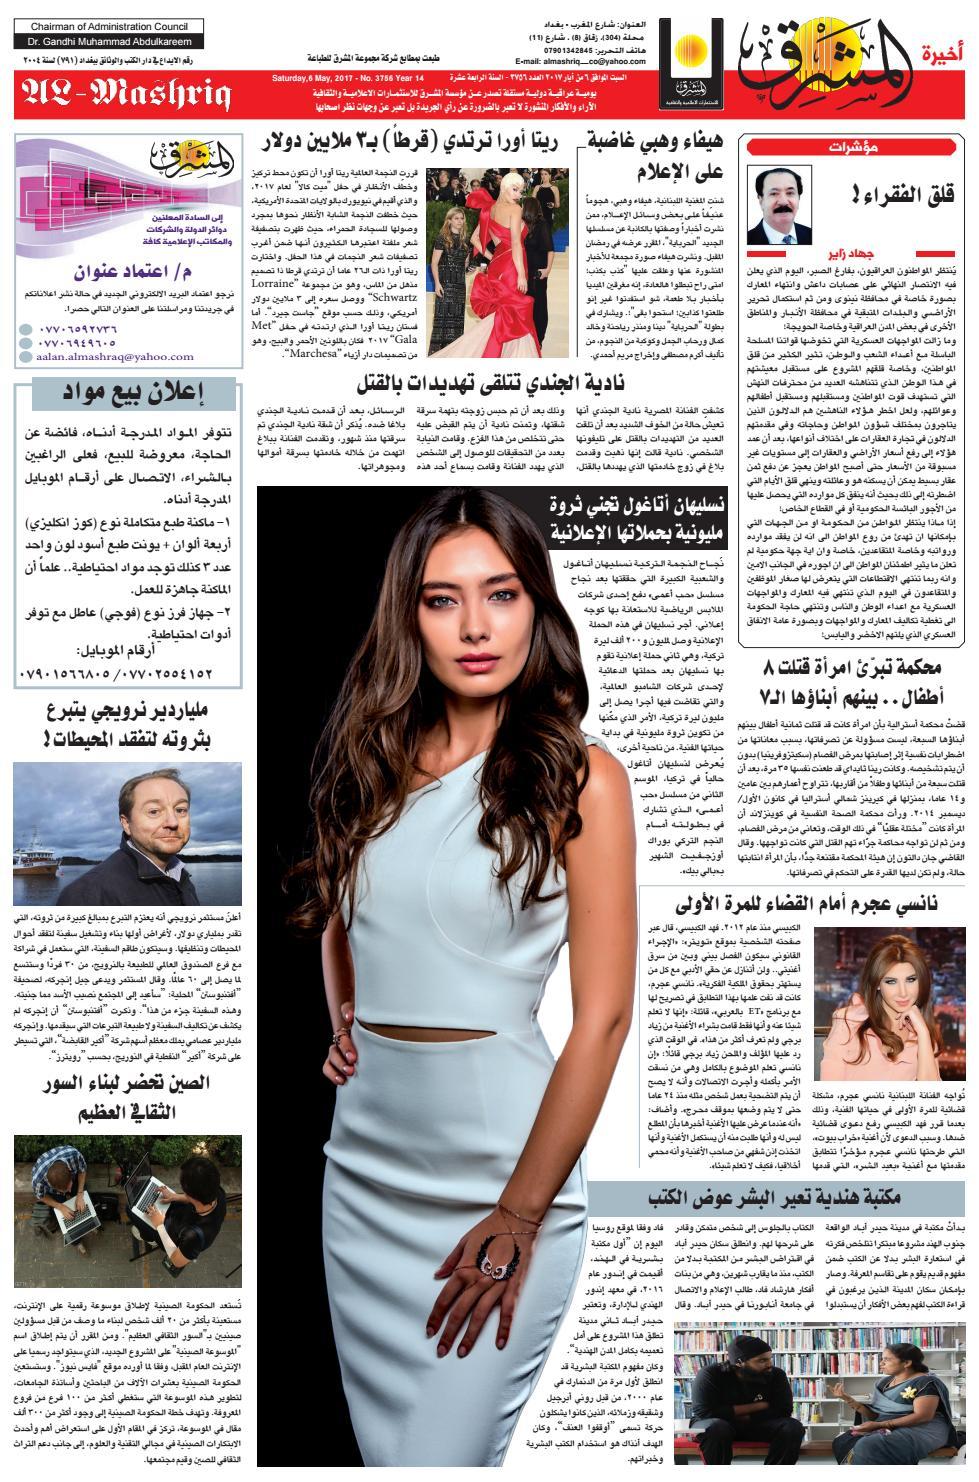 78b16134c8c5c 3756 AlmashriqNews by Al Mashriq Newspaper - issuu